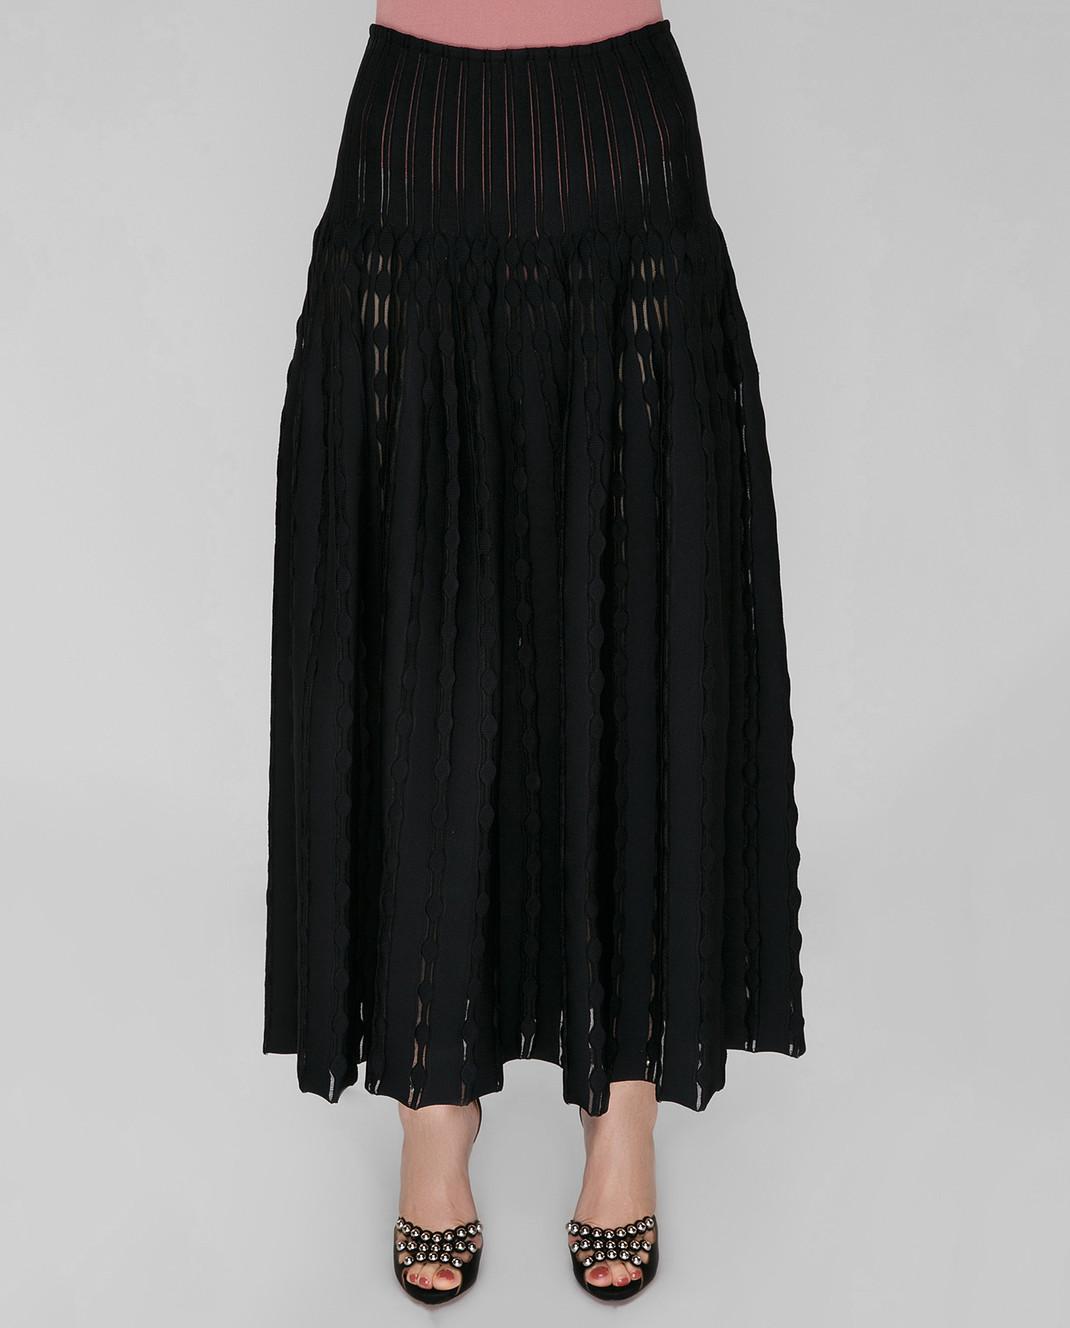 Azzedine Alaia Черная юбка 7S9JC55LM297 изображение 2